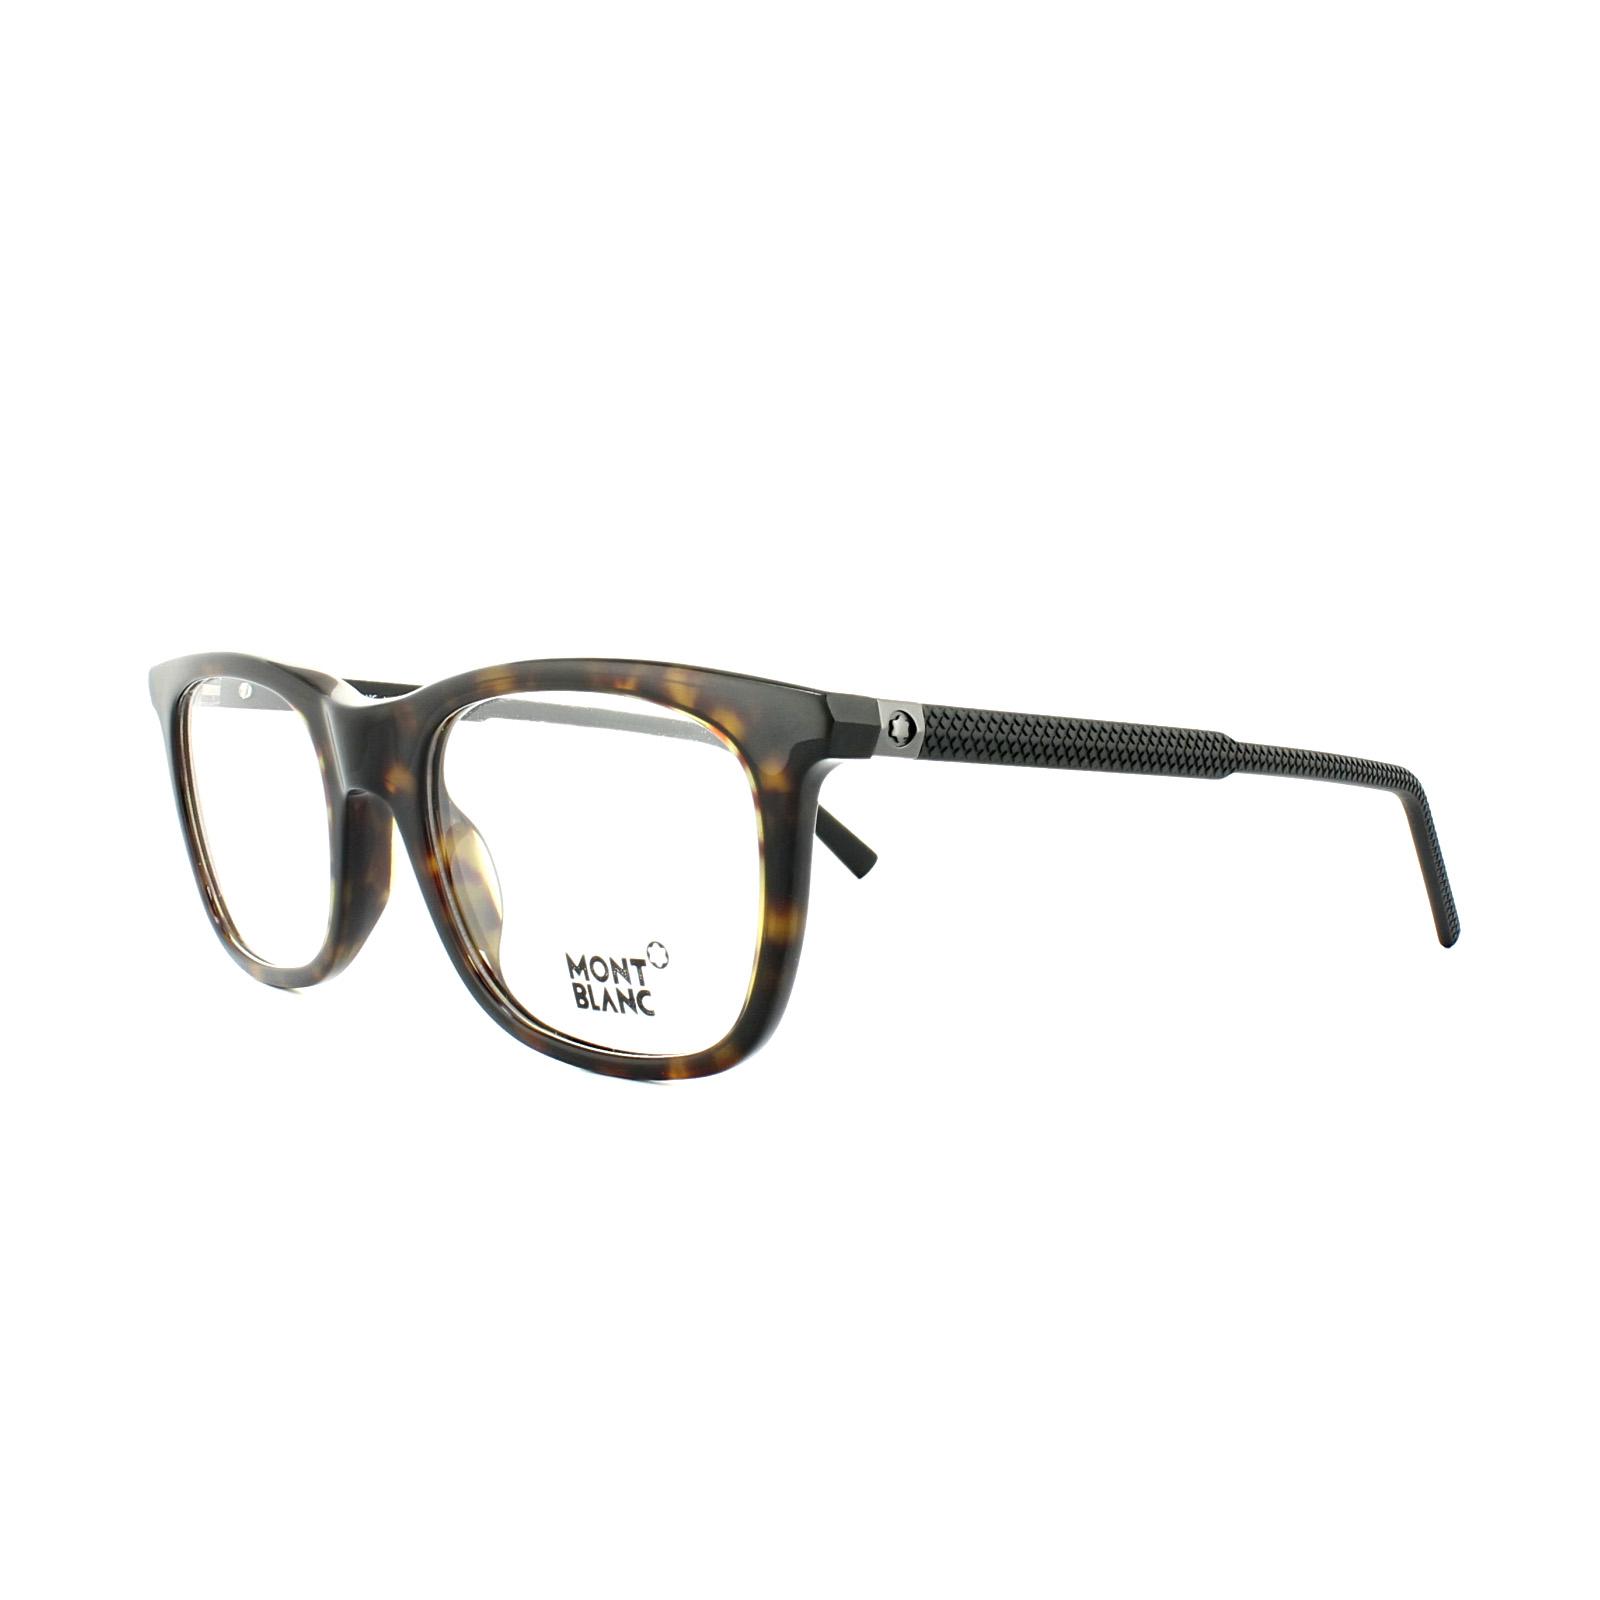 e52d94e88ee Sentinel Mont Blanc Glasses Frames MB0610 056 Brown Tortoise Black